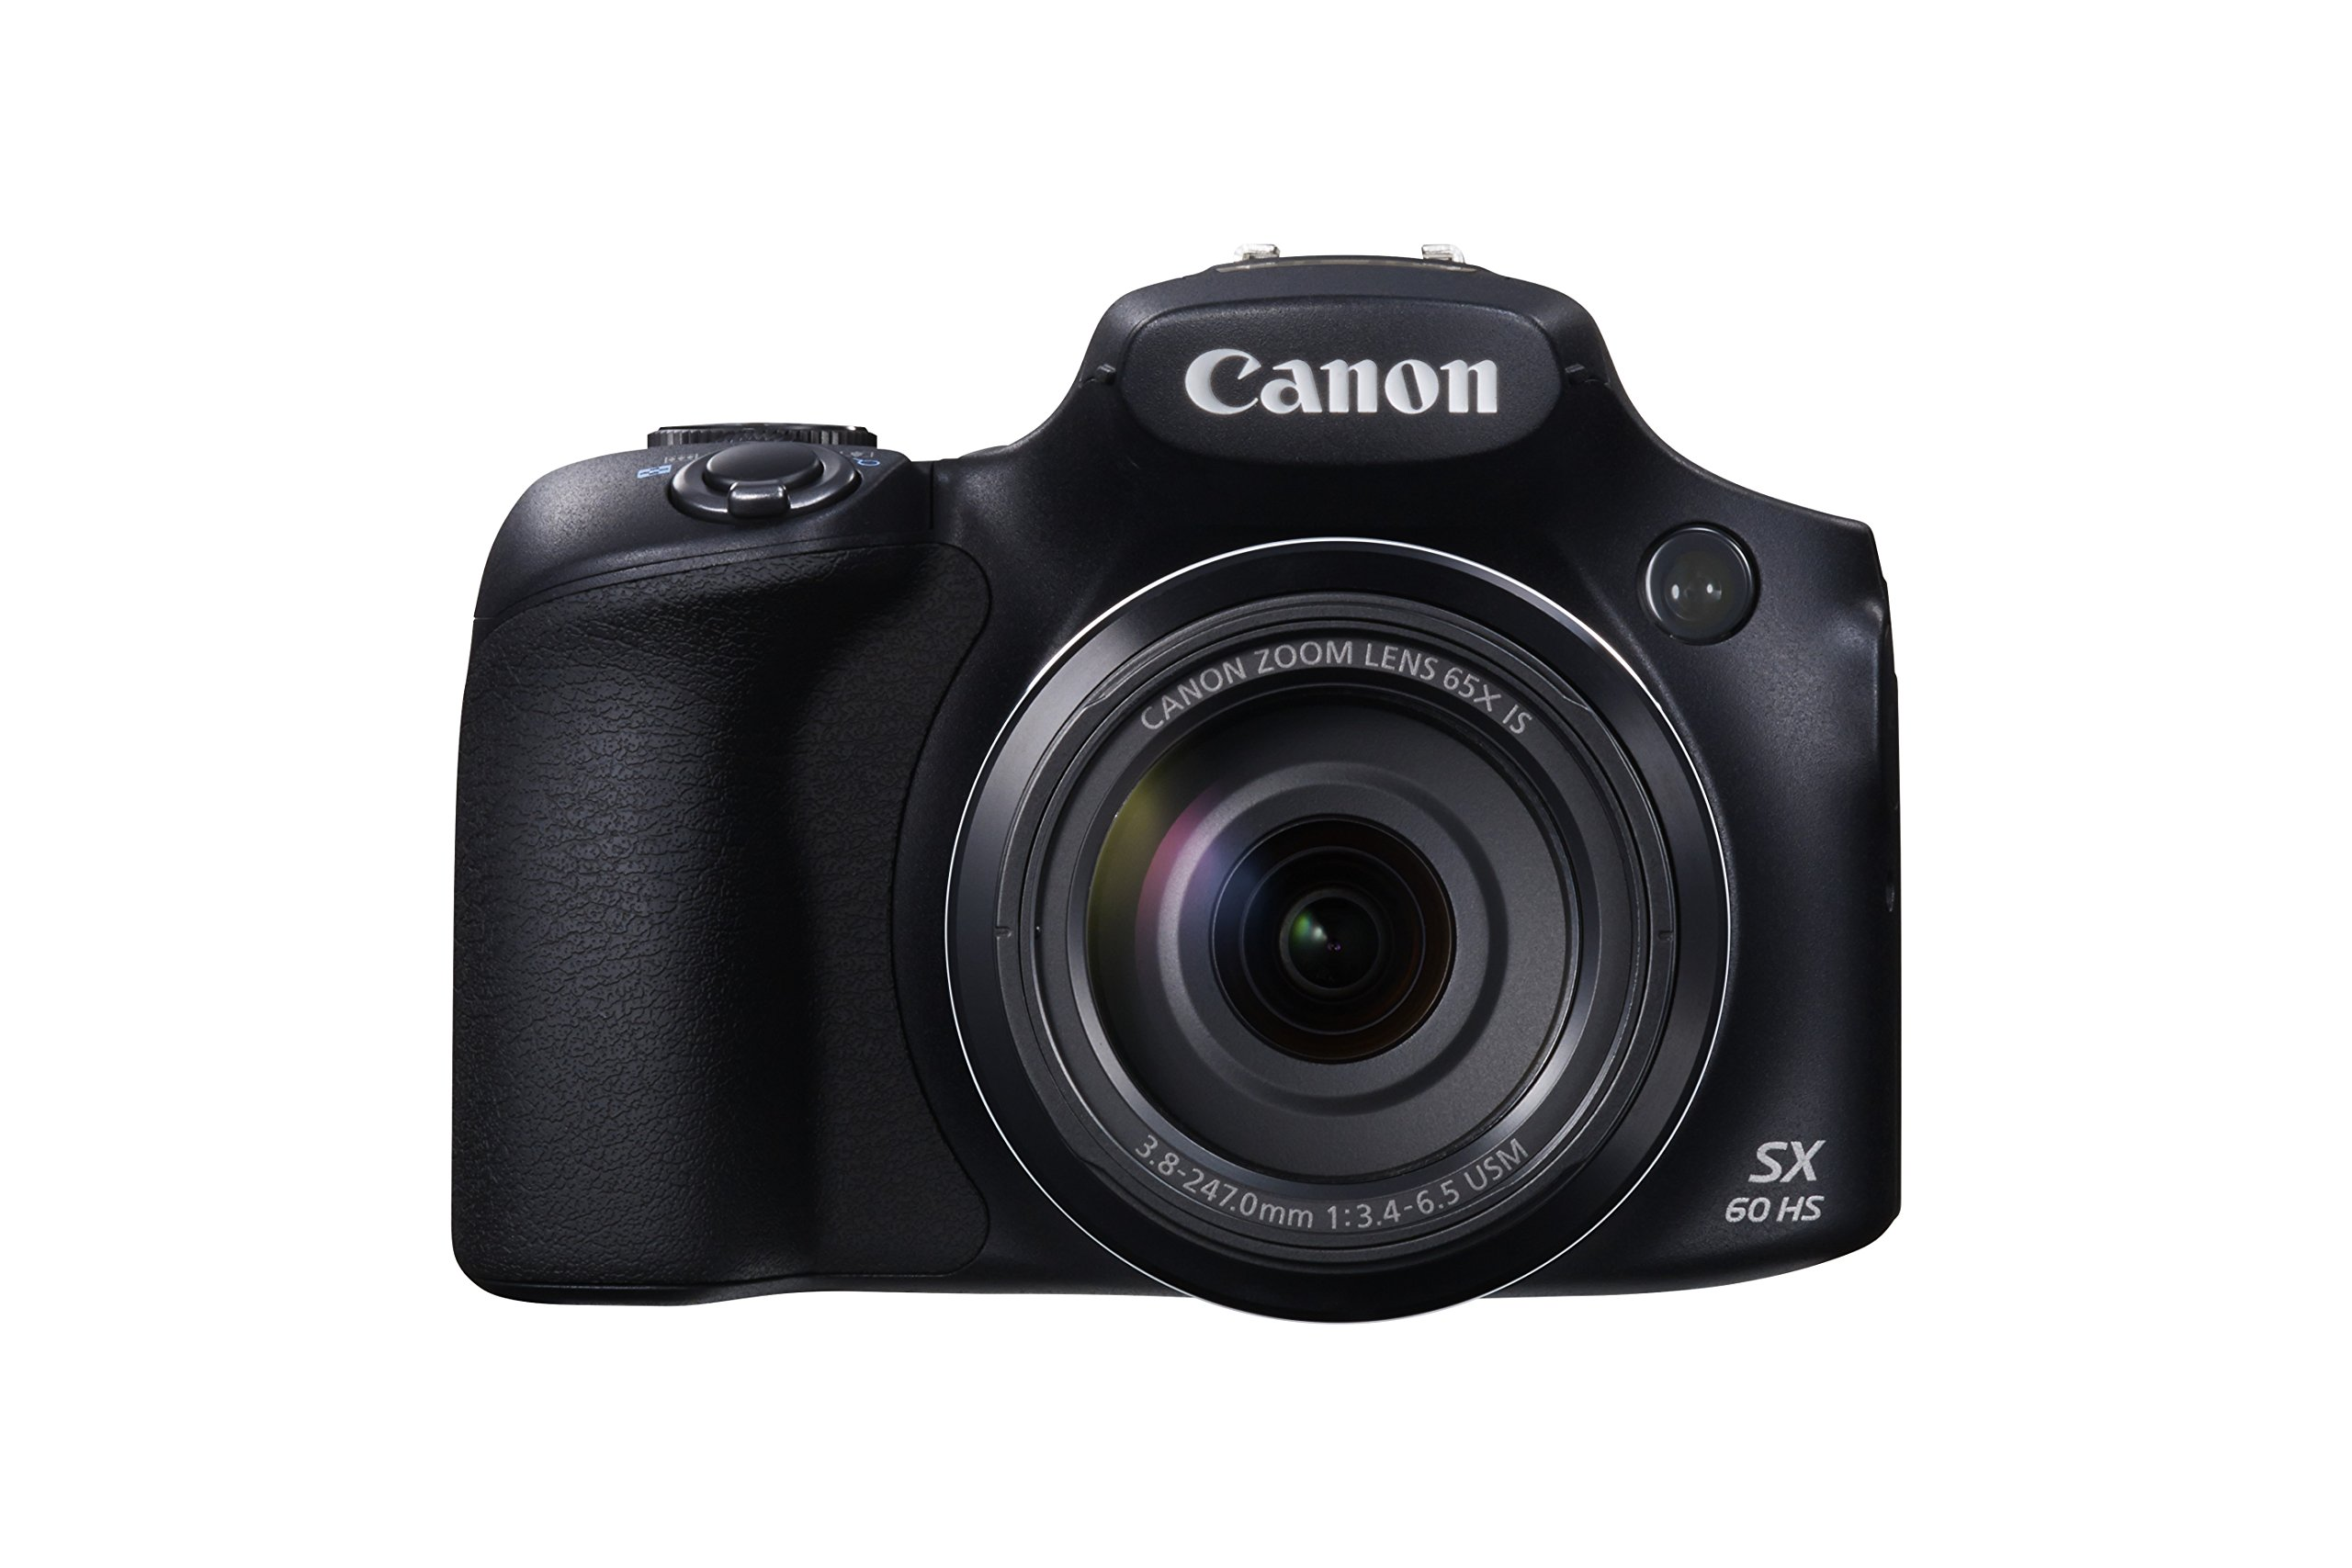 Canon PowerShot SX60 HS Fotocamera Compatta Digitale, 16 Megapixel, Nero/Antracite product image